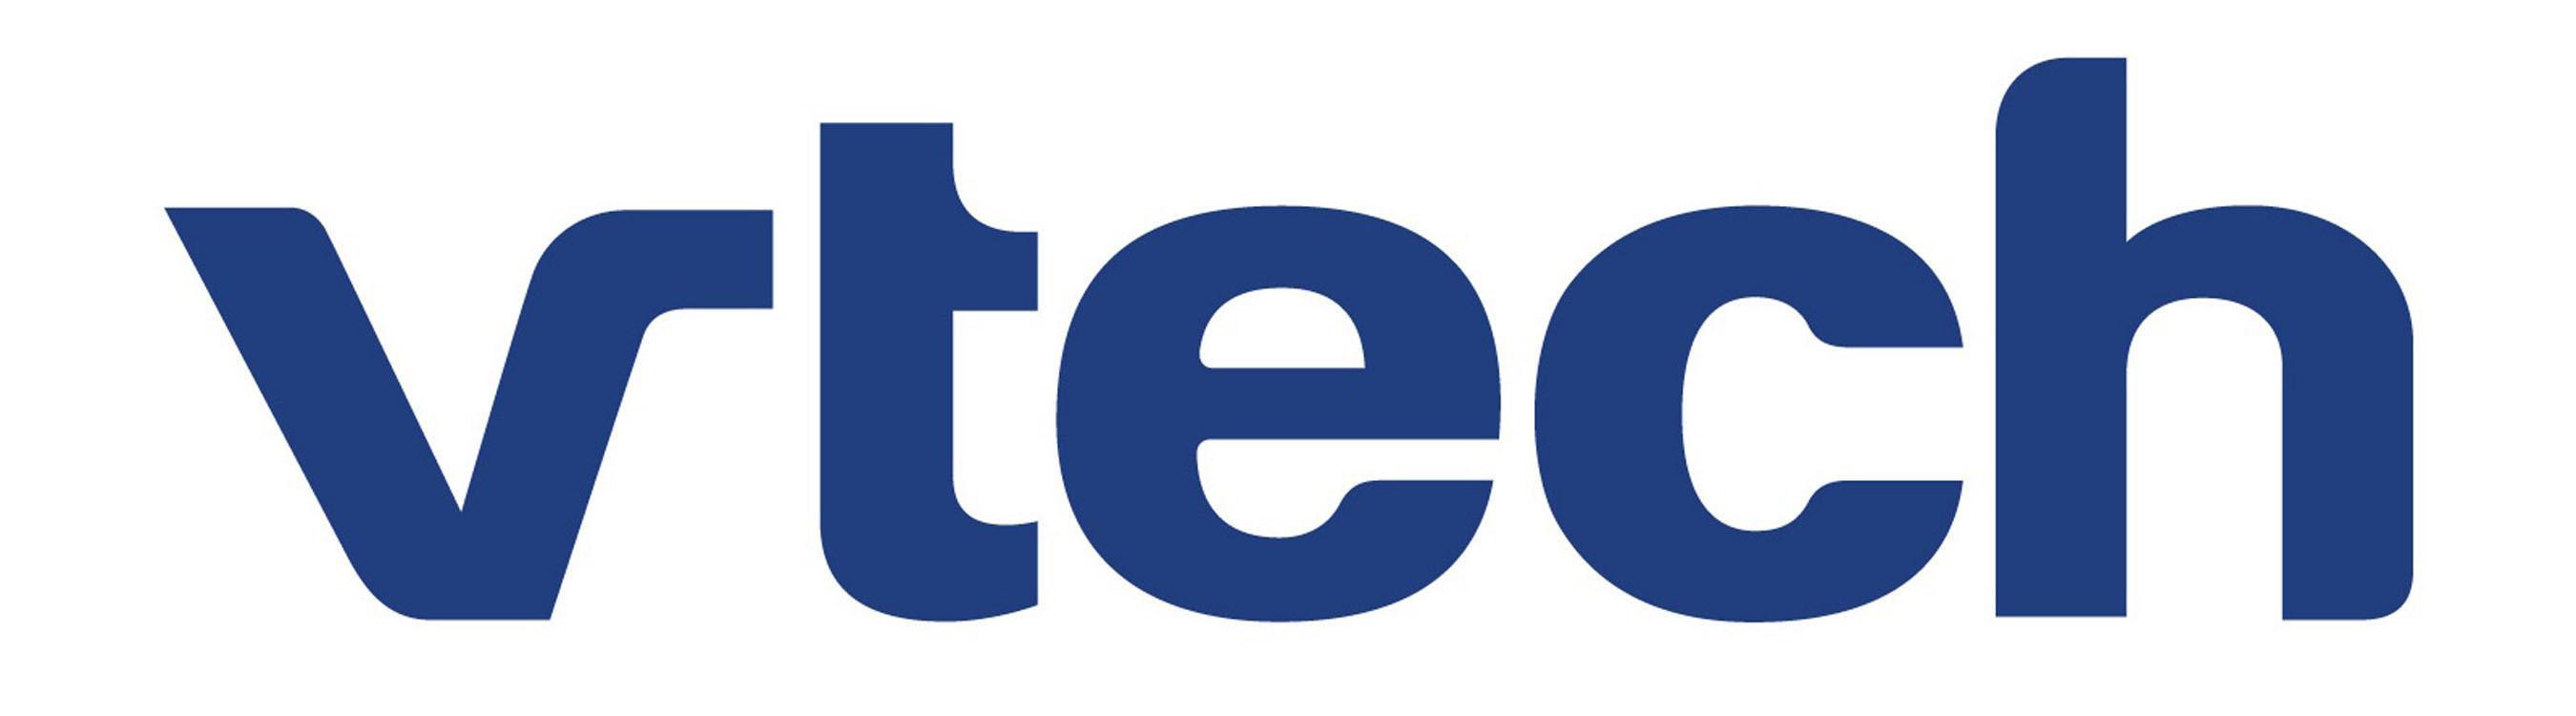 VTech Announces 2015/2016 Interim Results